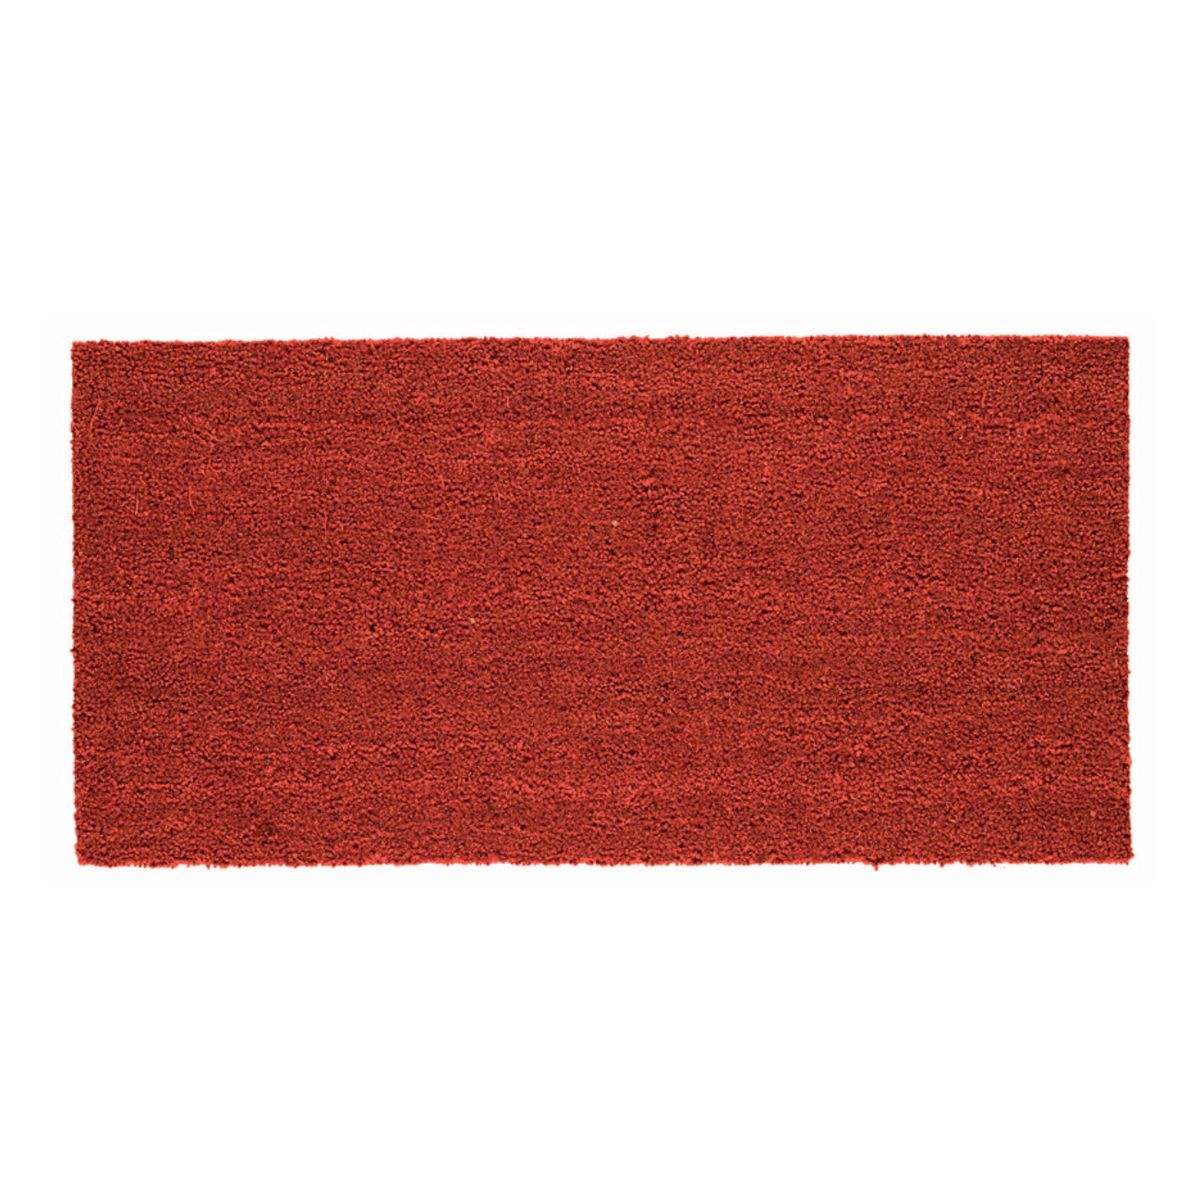 Zerbino rosso 40 x 80 cm prezzi e offerte online for Tralicci leroy merlin